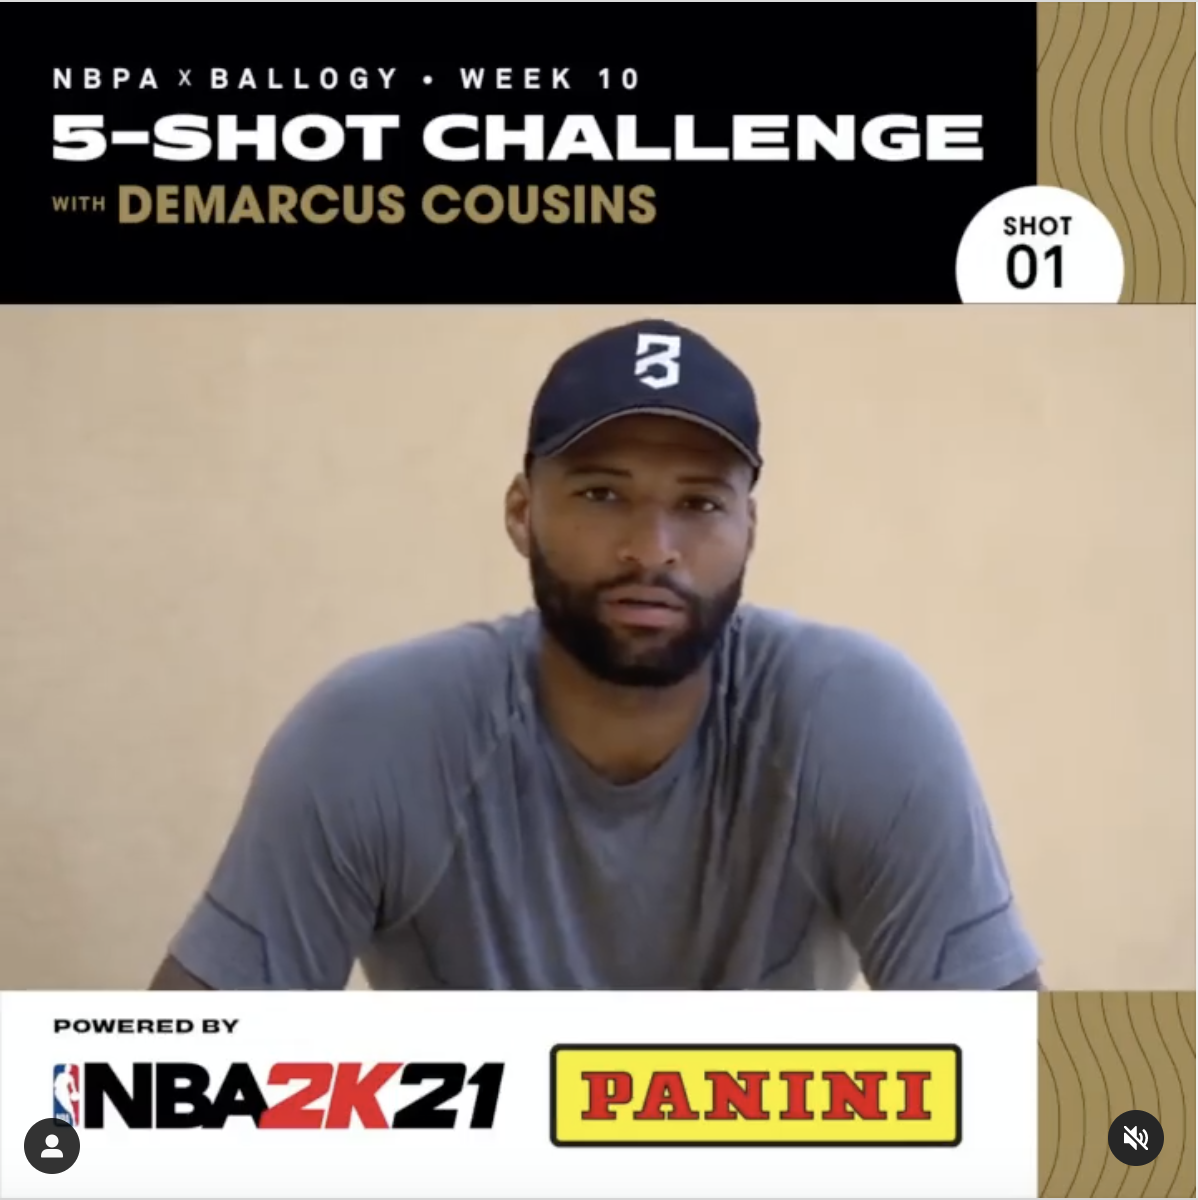 NBPA x Ballogy 5-Shot Challenge: DeMarcus Cousins